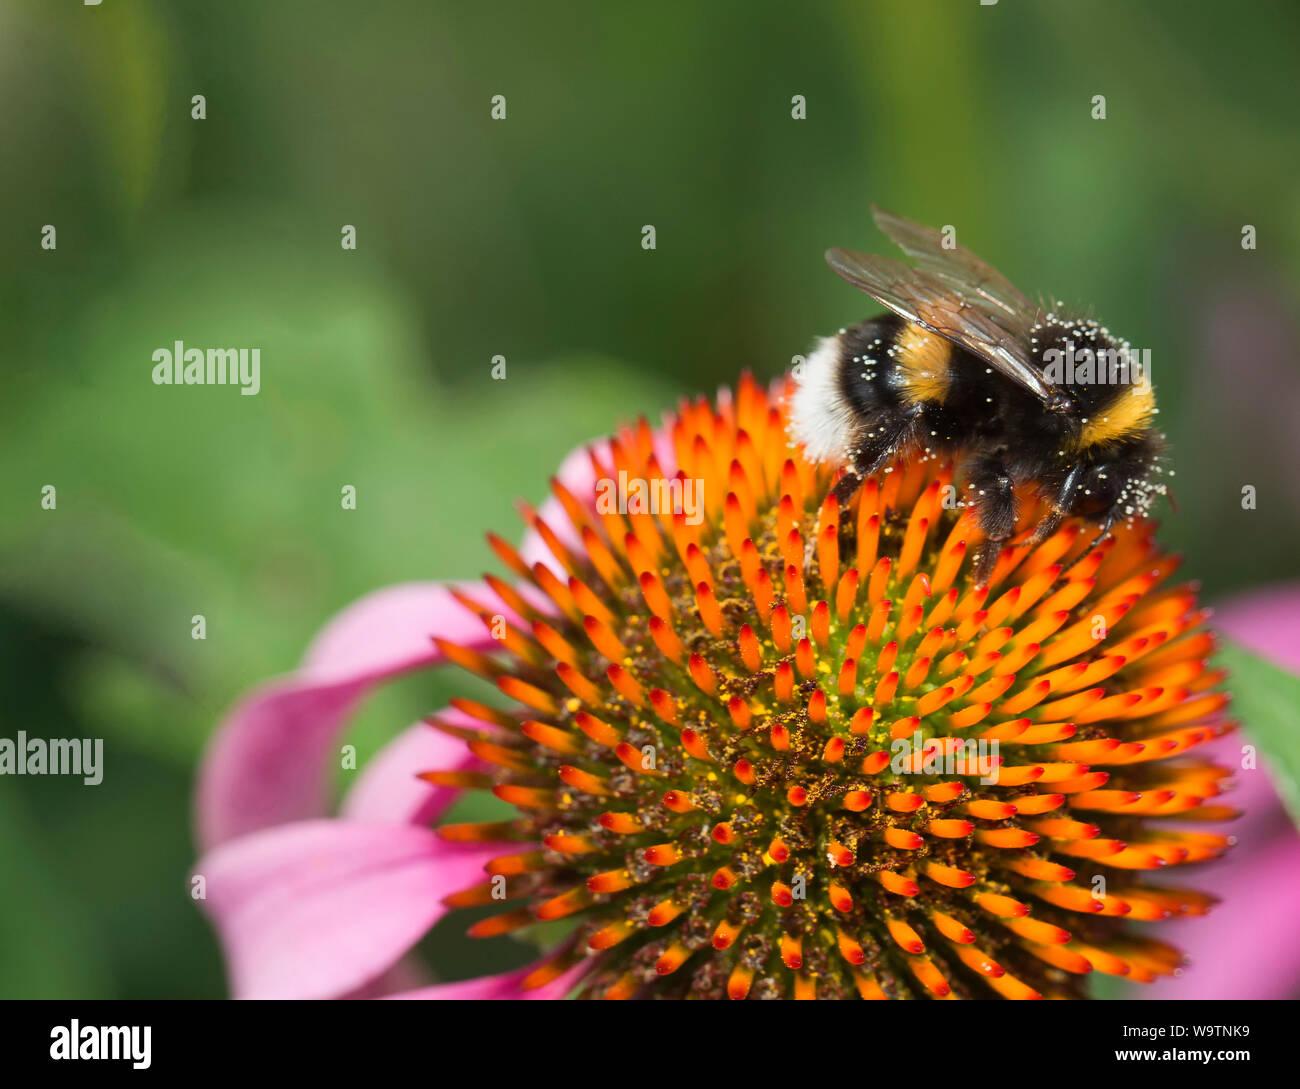 Sentarse en un abejorro coneflower Foto de stock